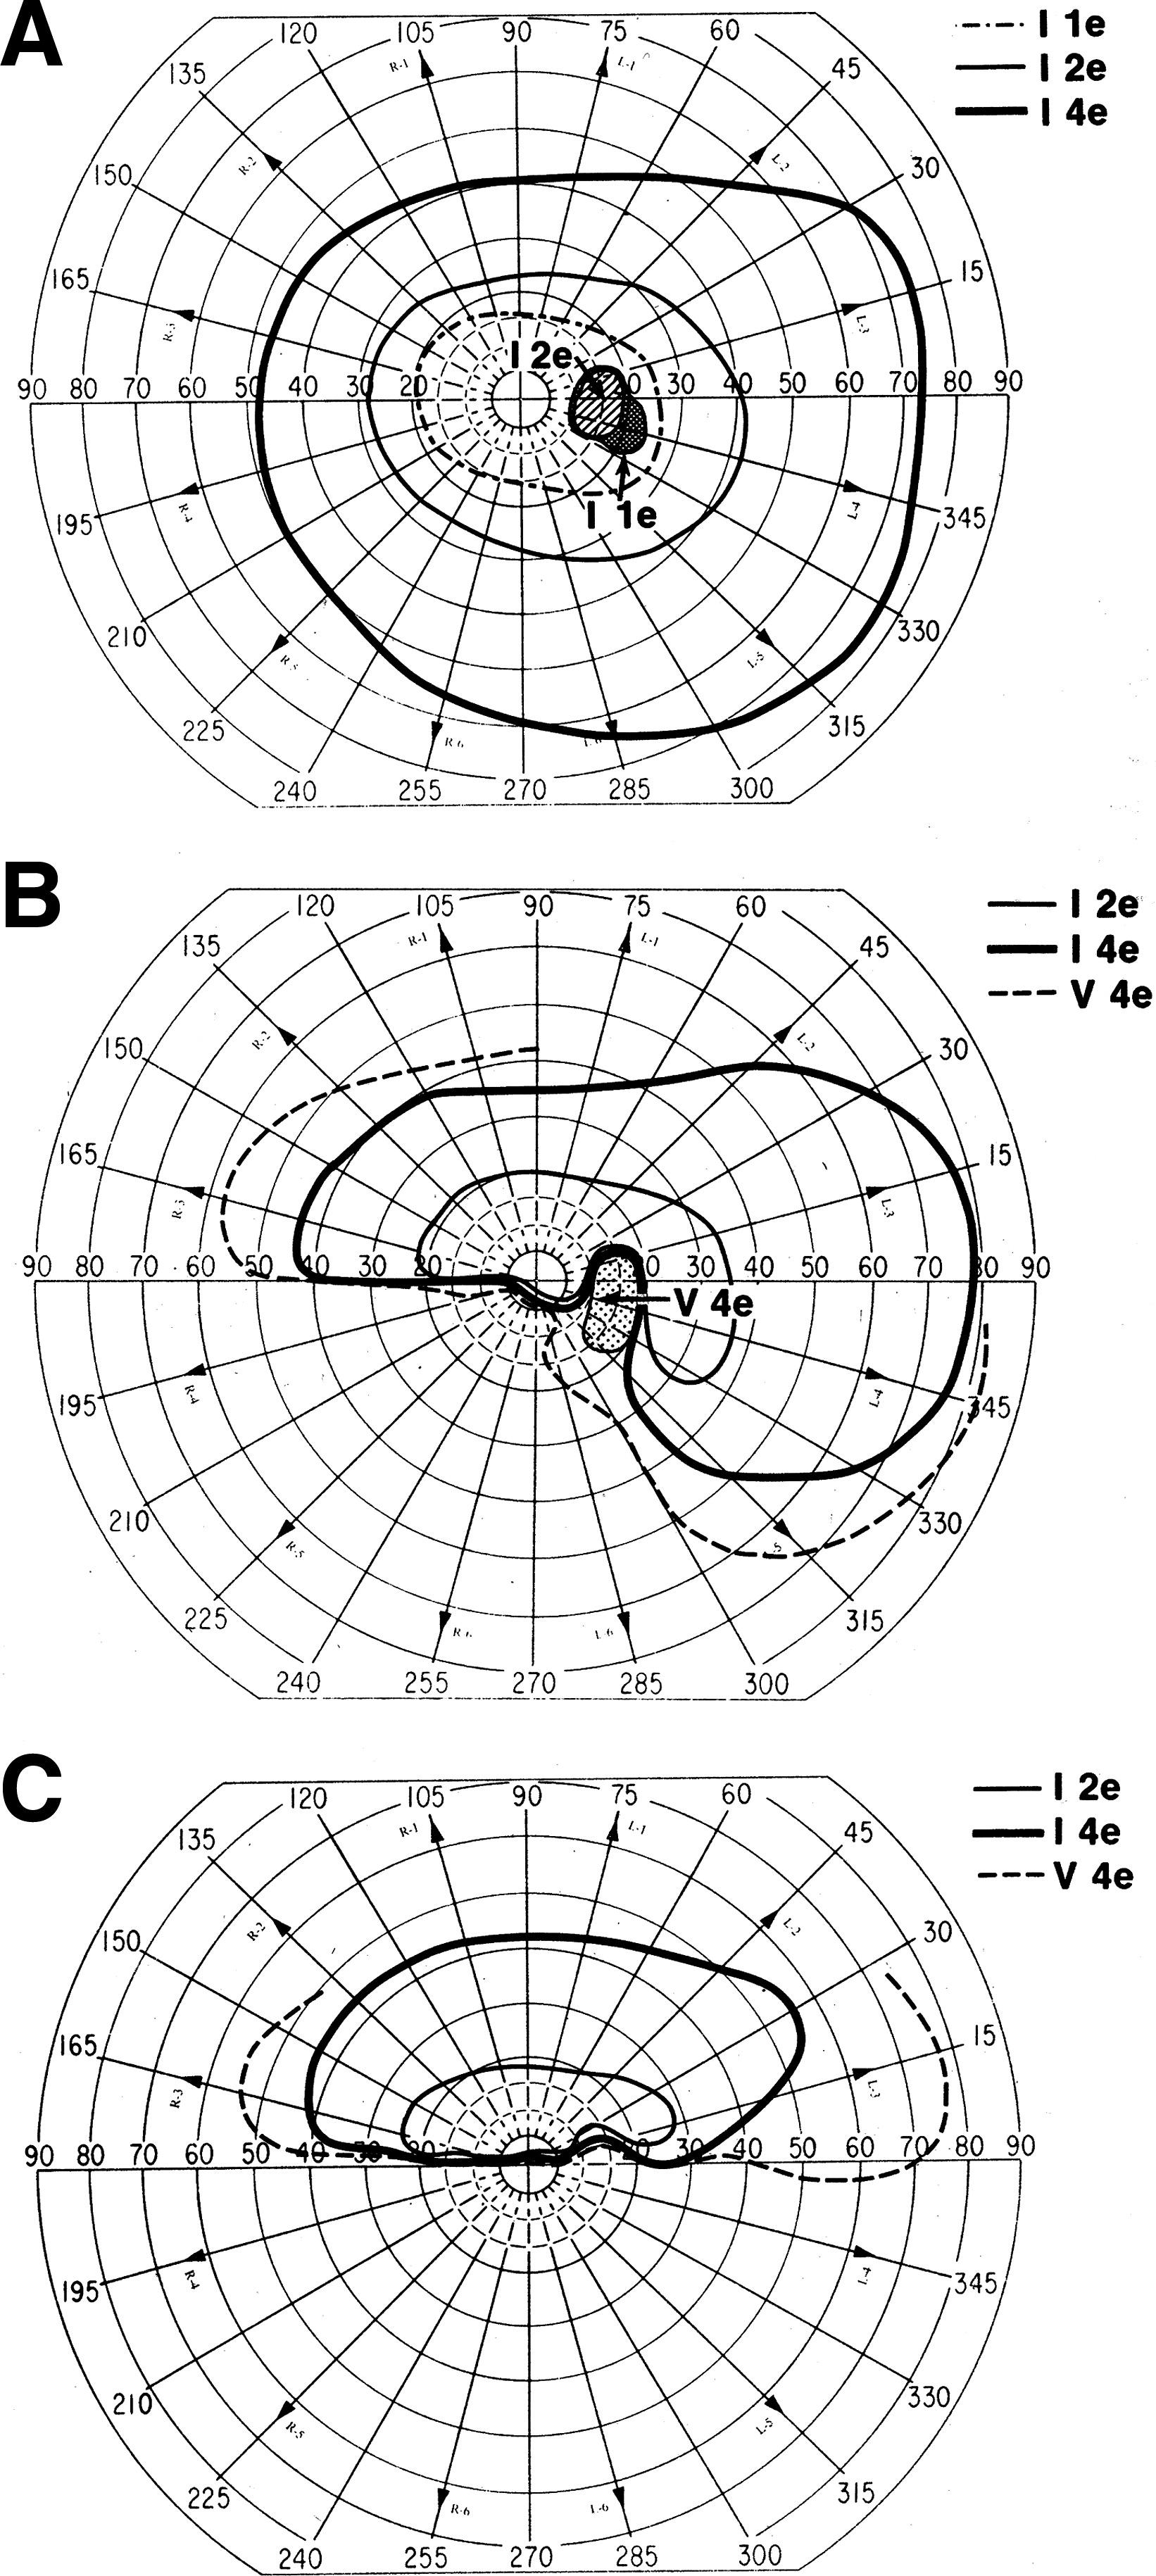 Incipient Nonarteritic Anterior Ischemic Optic Neuropathy